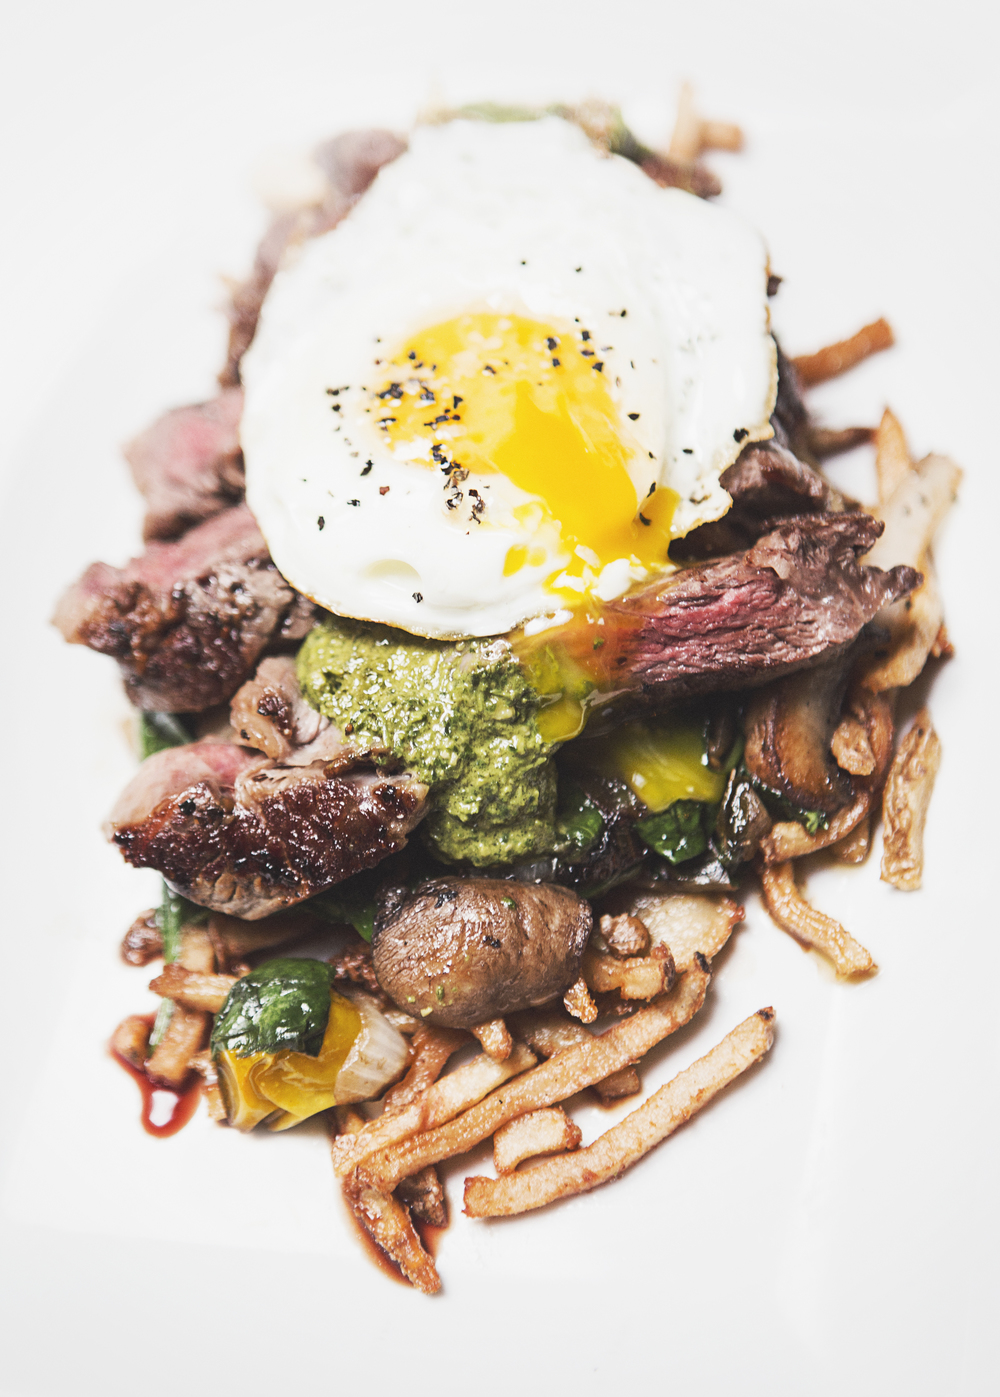 Steak and eggs.